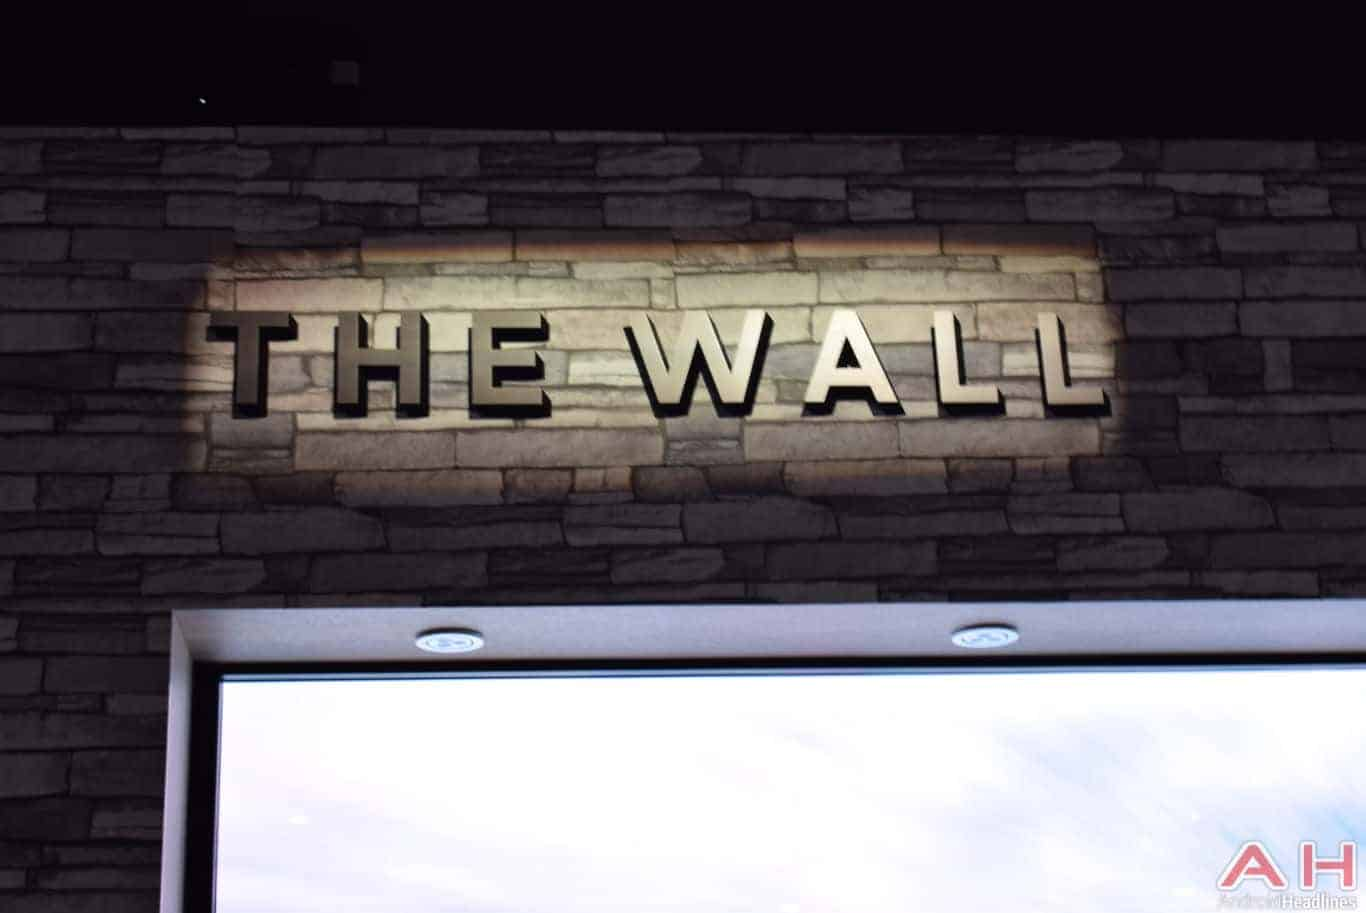 Samsung The Wall Modular MicroLED TV CES 2018 AH 6